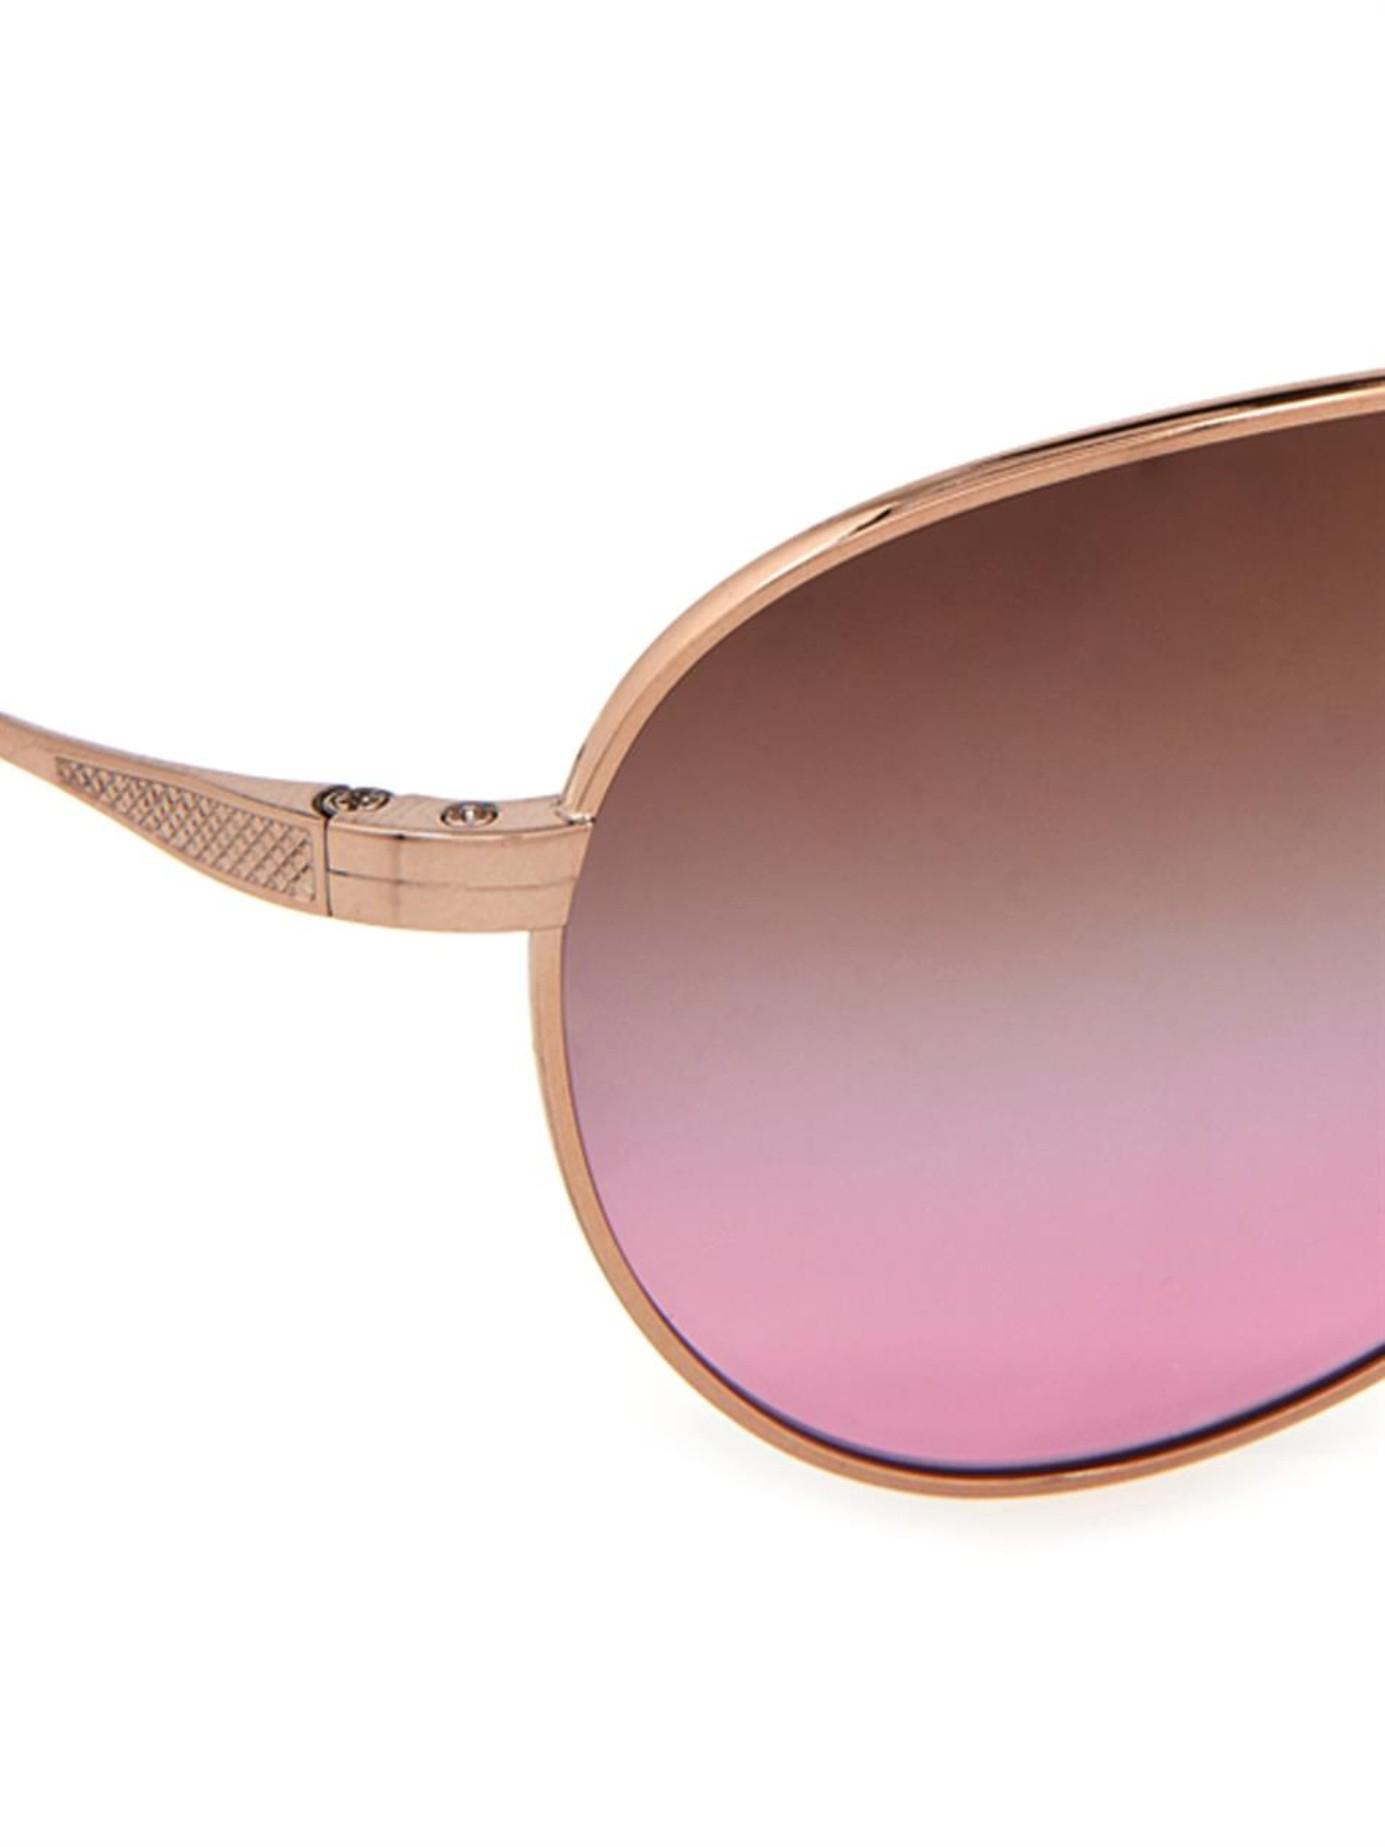 Barton Perreira Lovitt Aviator Style Sunglasses In Pink Lyst